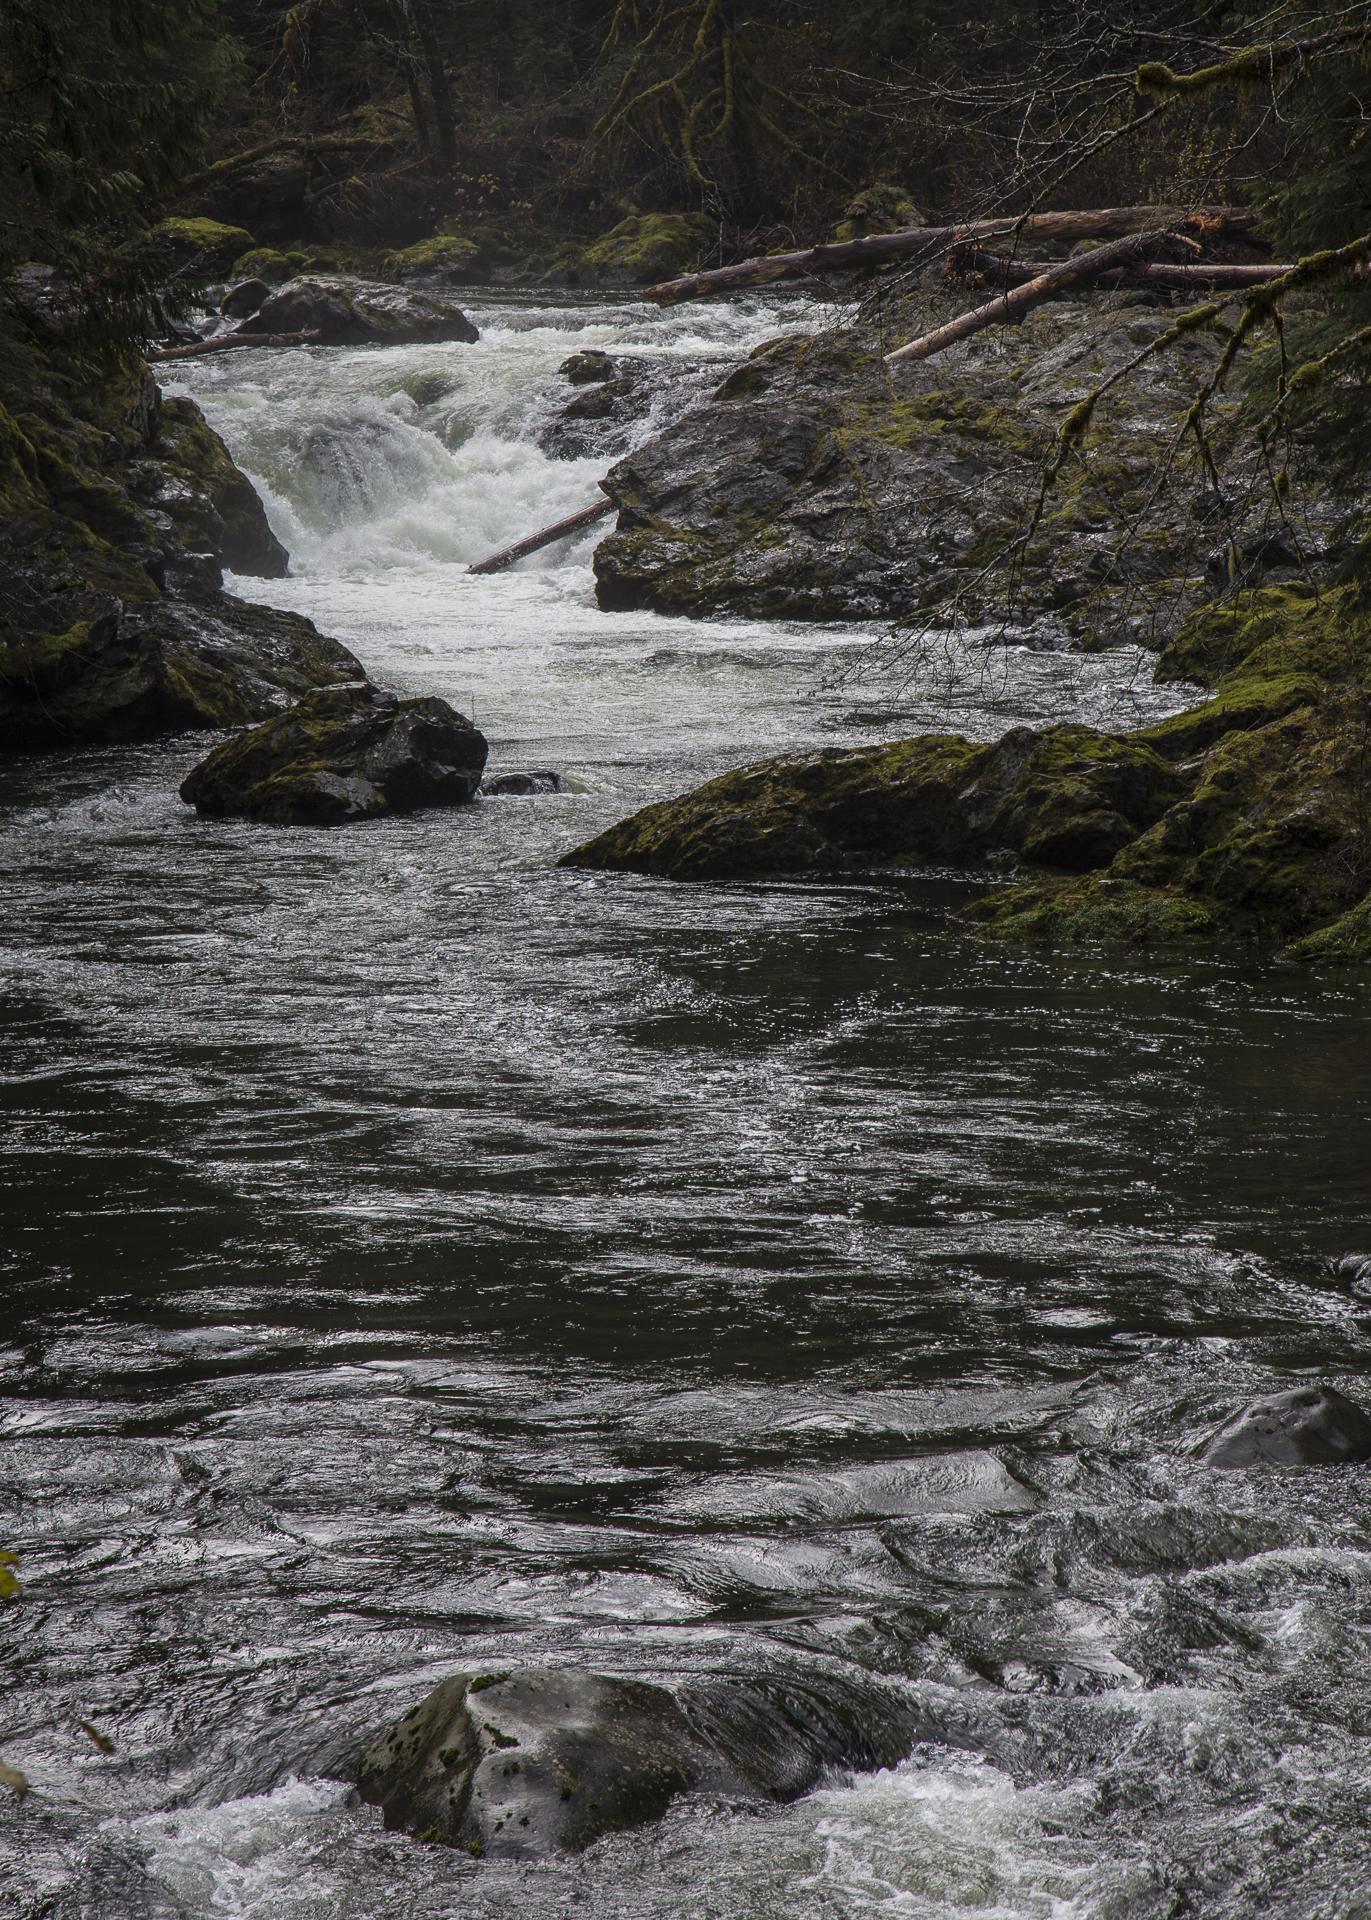 Salmon Cascades